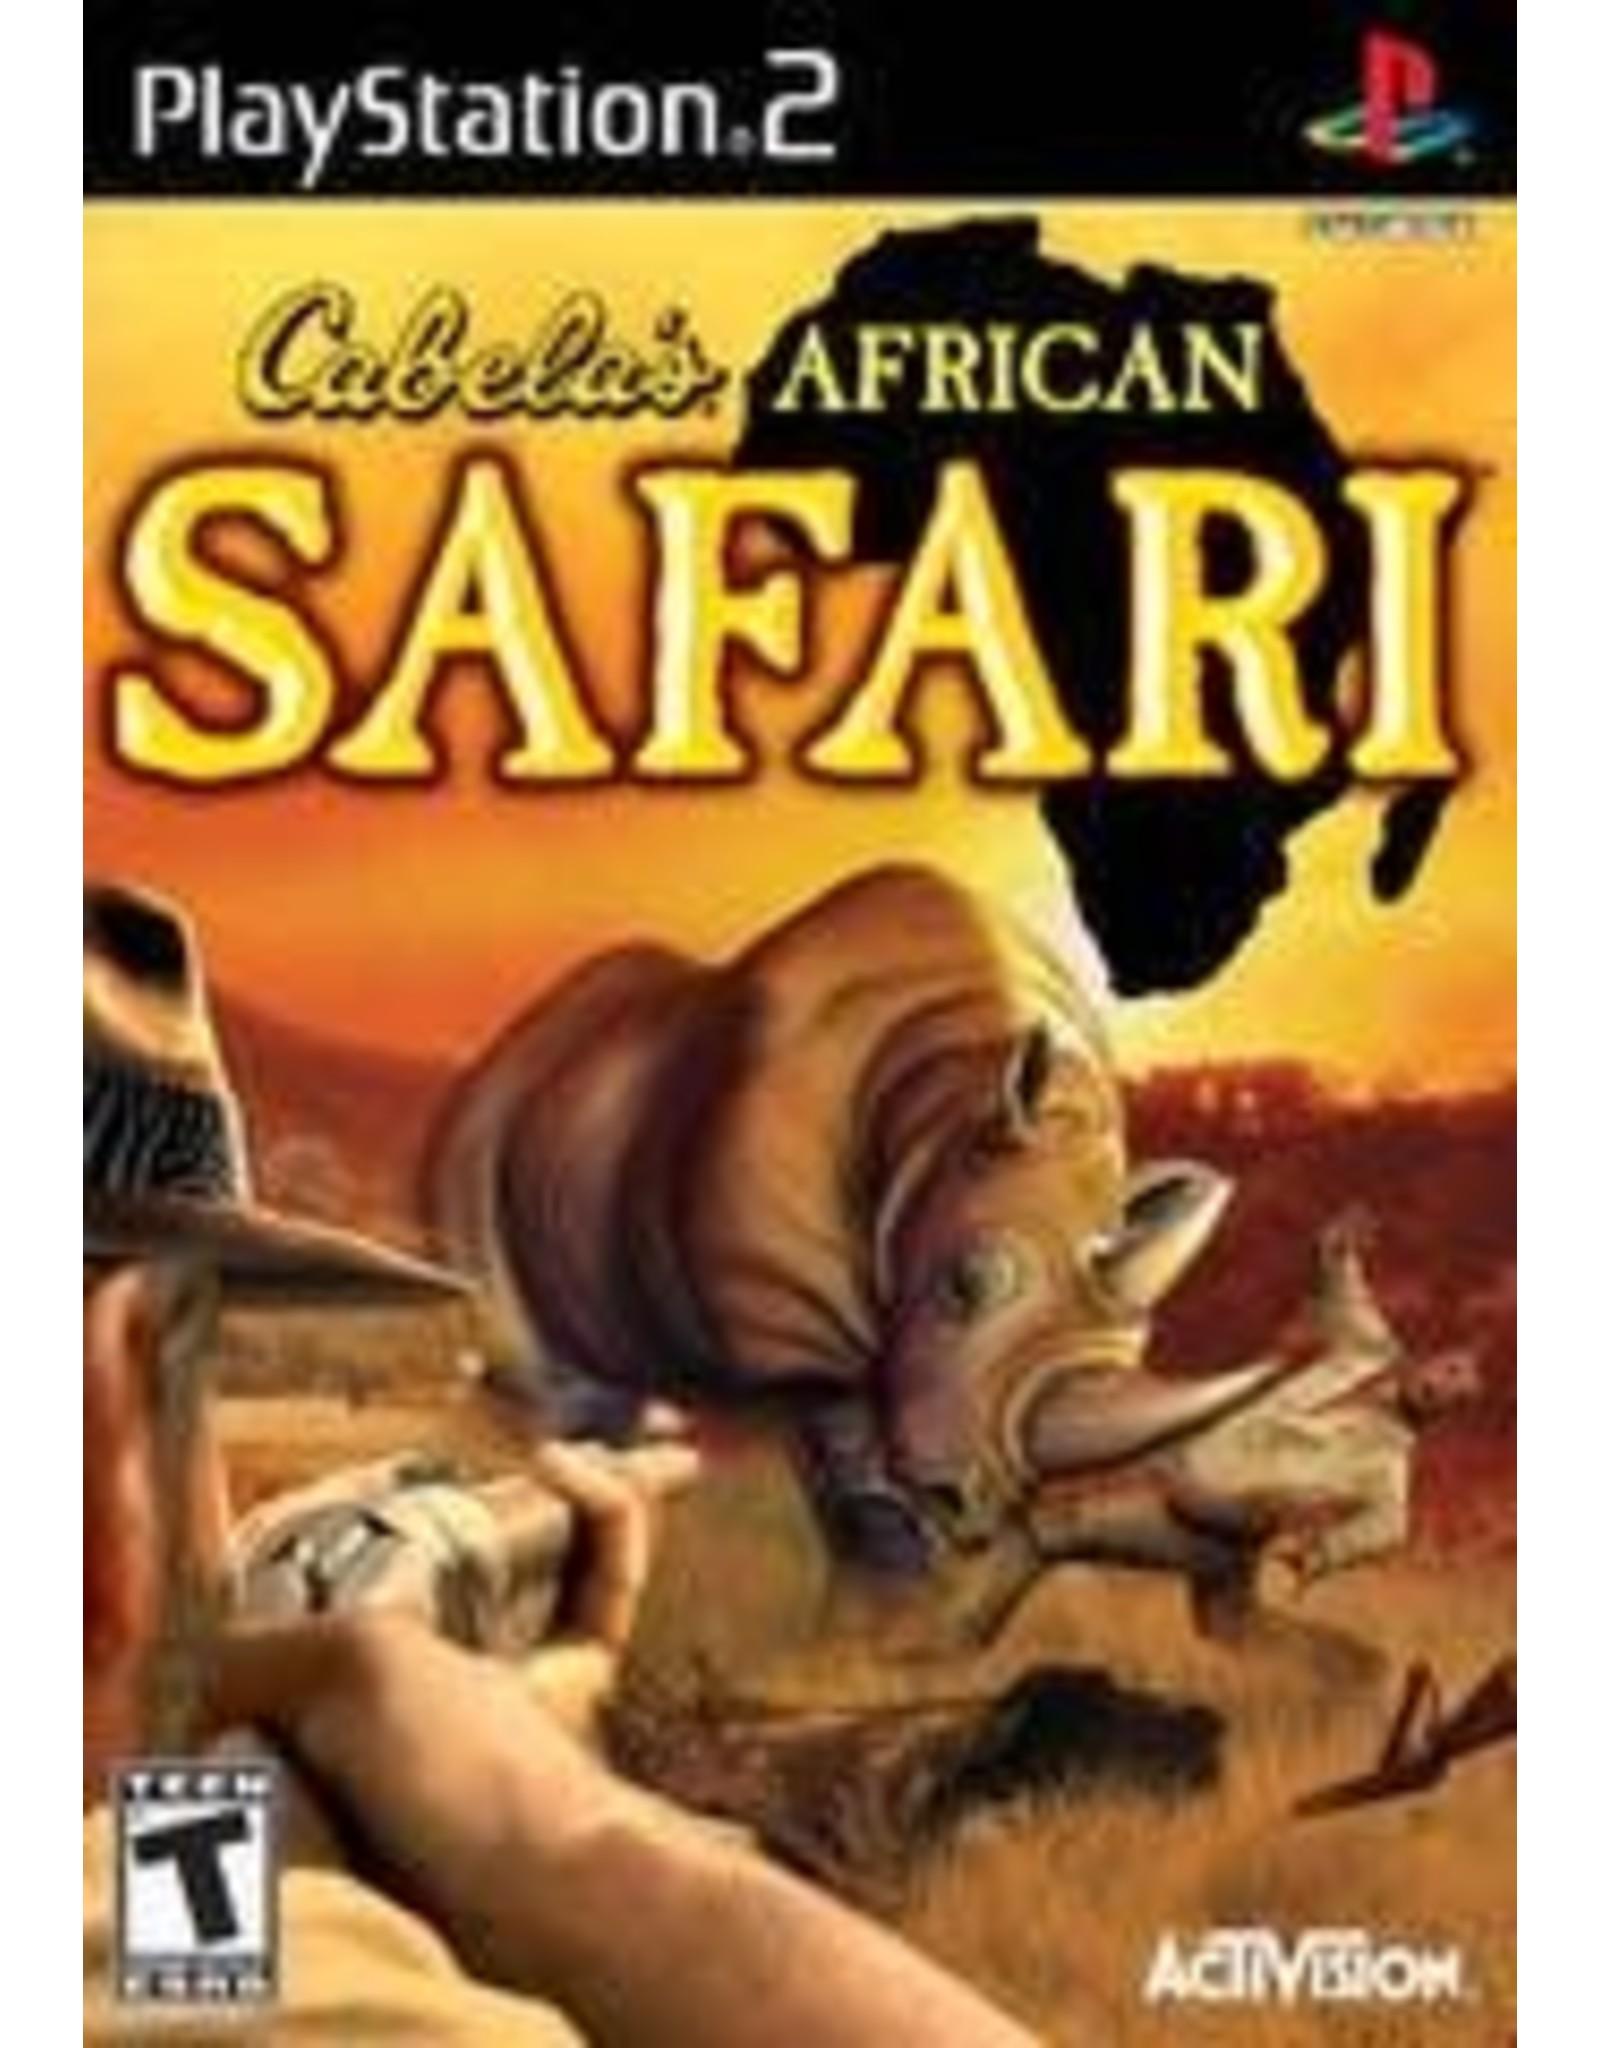 Playstation 2 Cabela's African Safari (CiB)